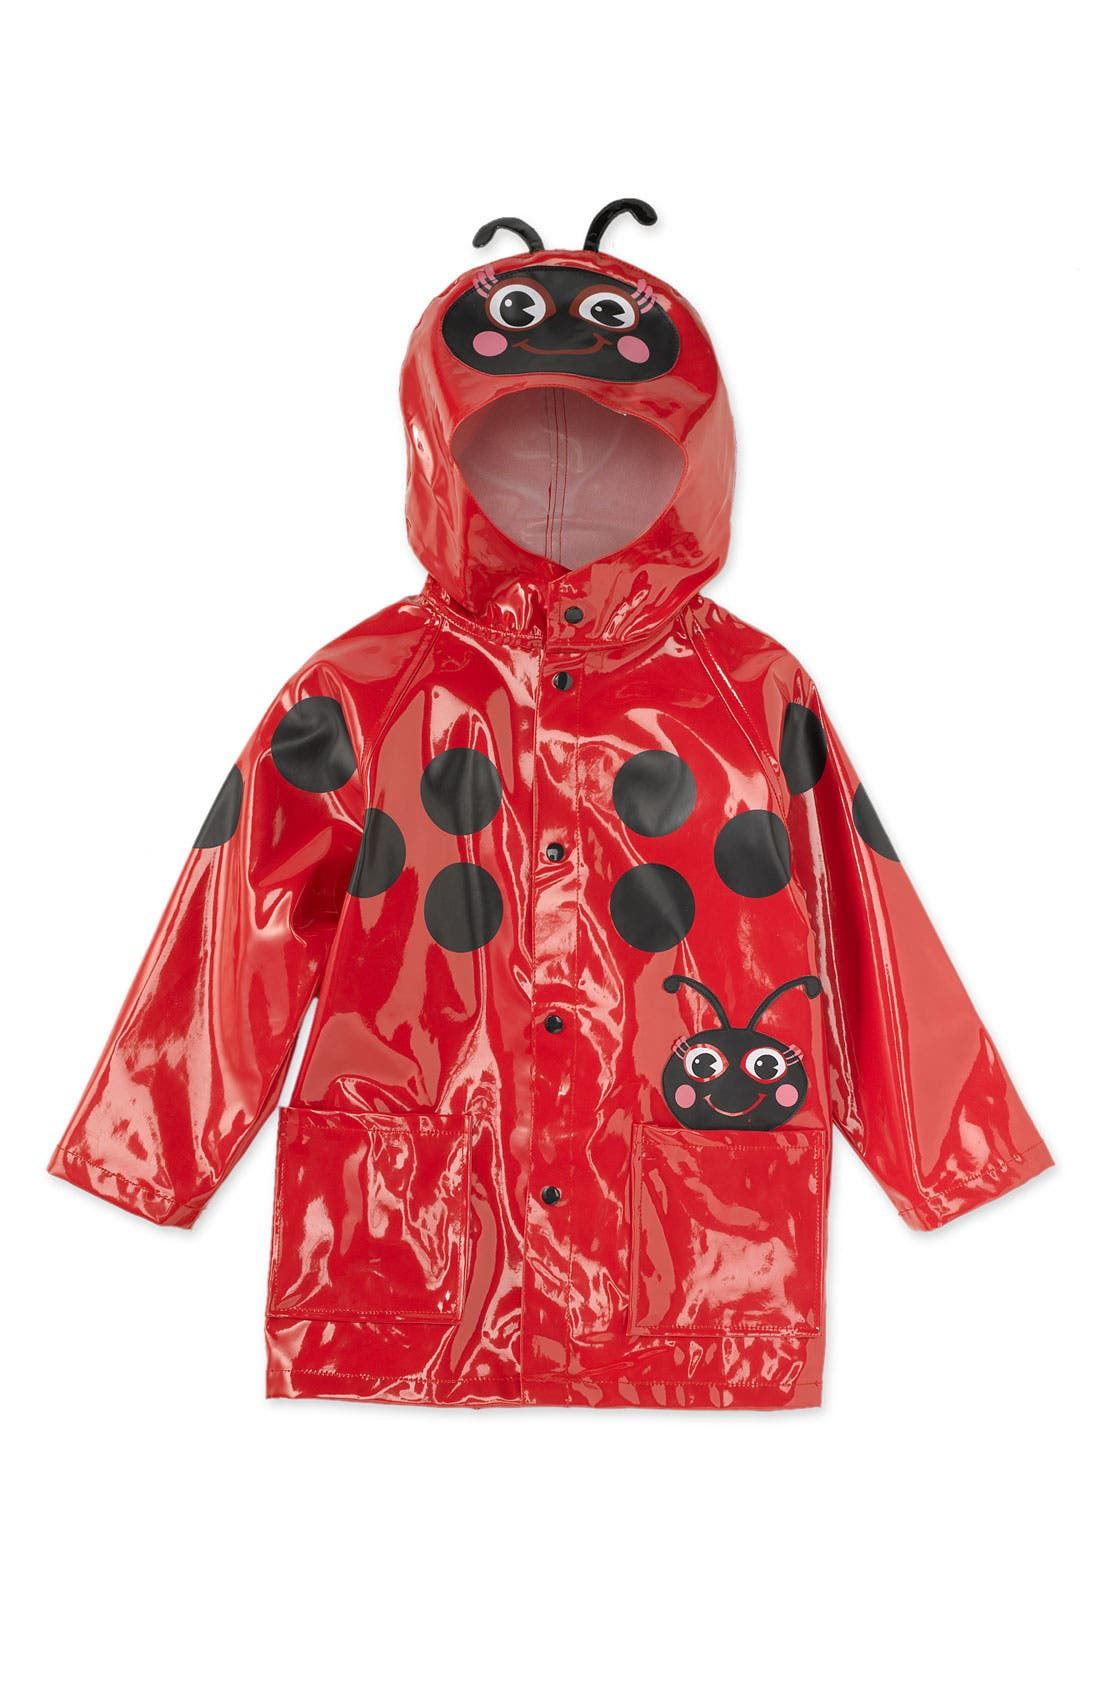 Alternate Image 1 Selected - Western Chief 'Ladybug' Raincoat (Little Kid)